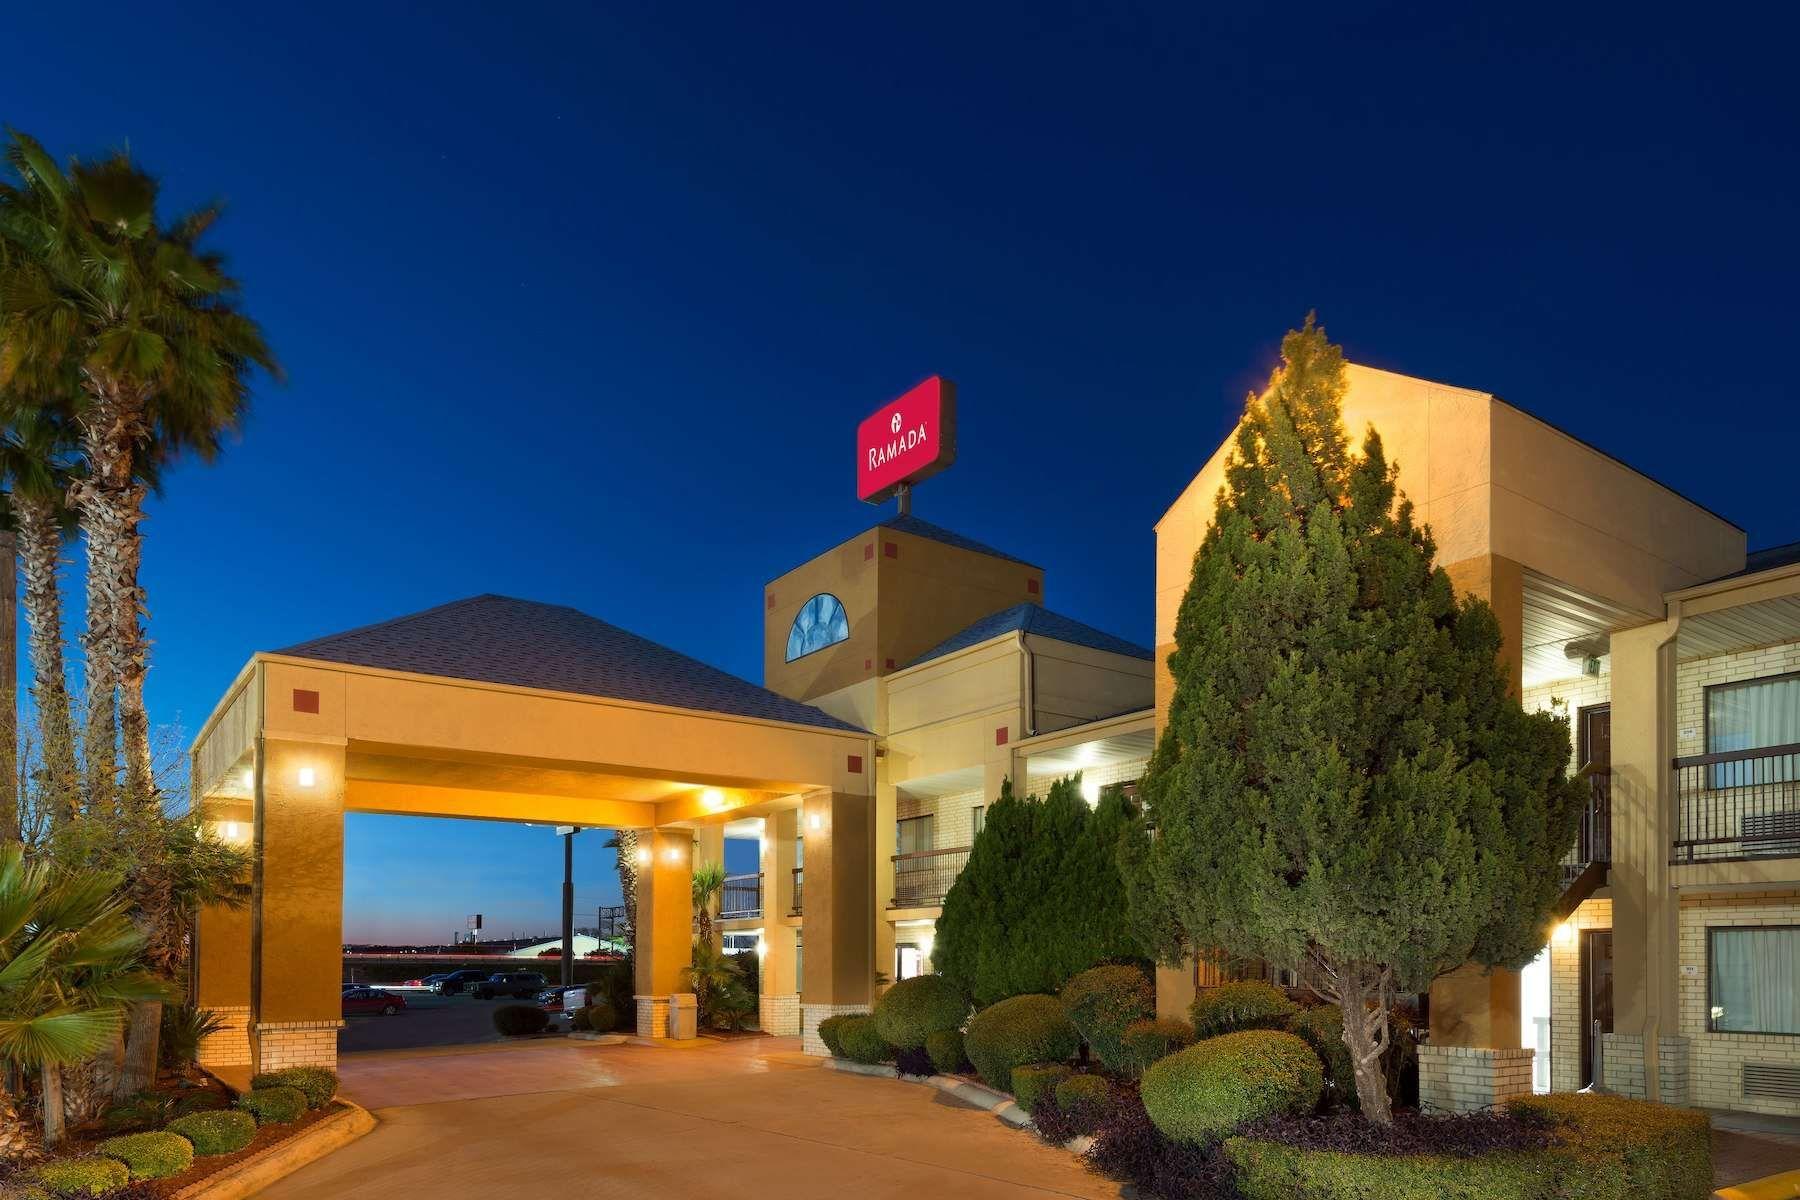 When you need beautiful San Antonio Hotels near SeaWorld